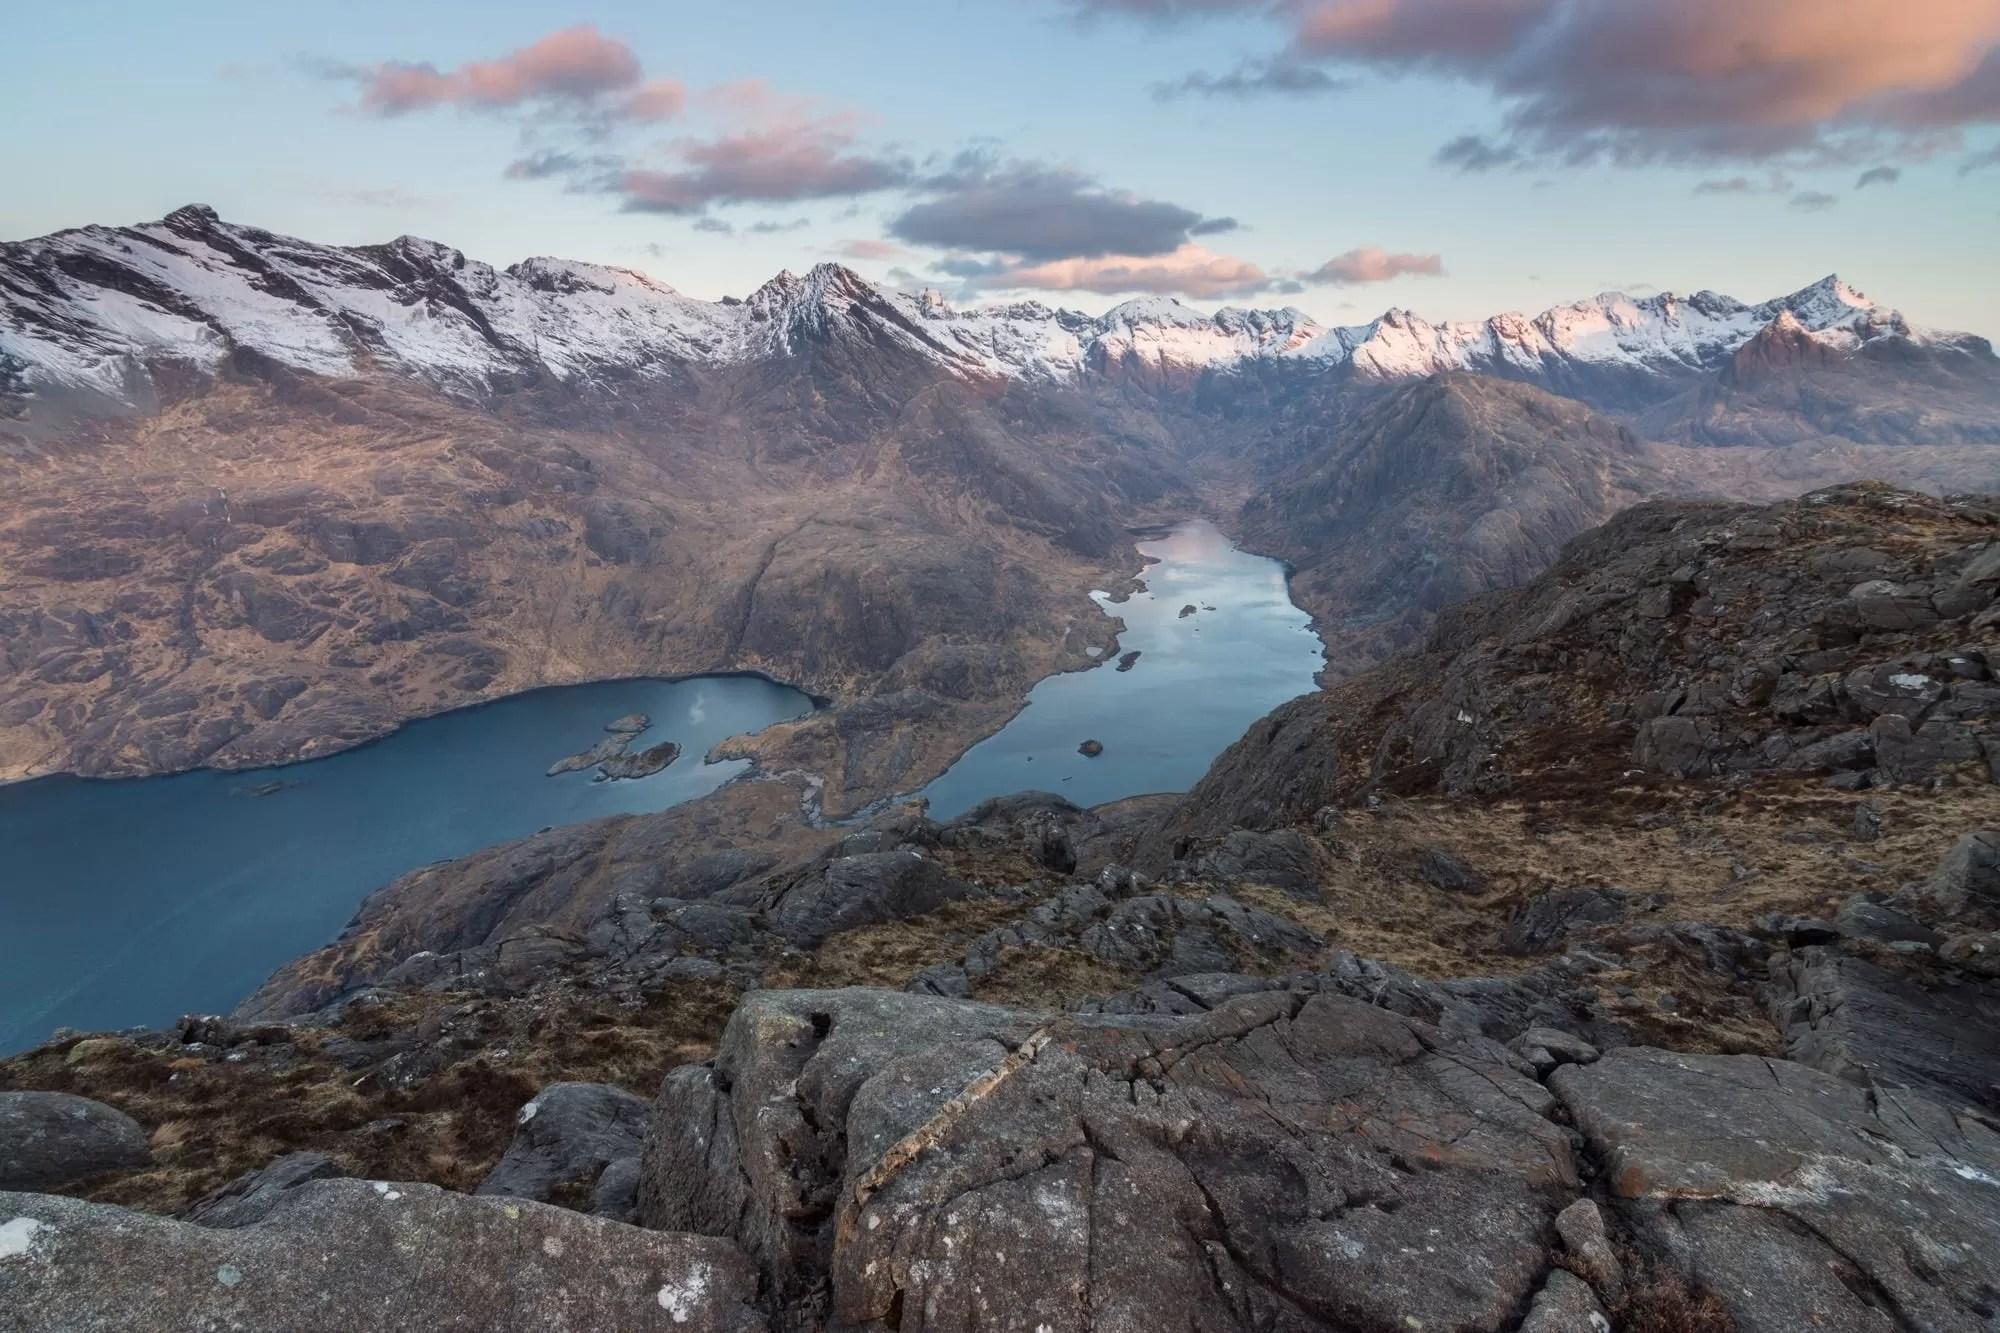 Sgurr Na Stri Sunrise - Scotland Photography Workshops